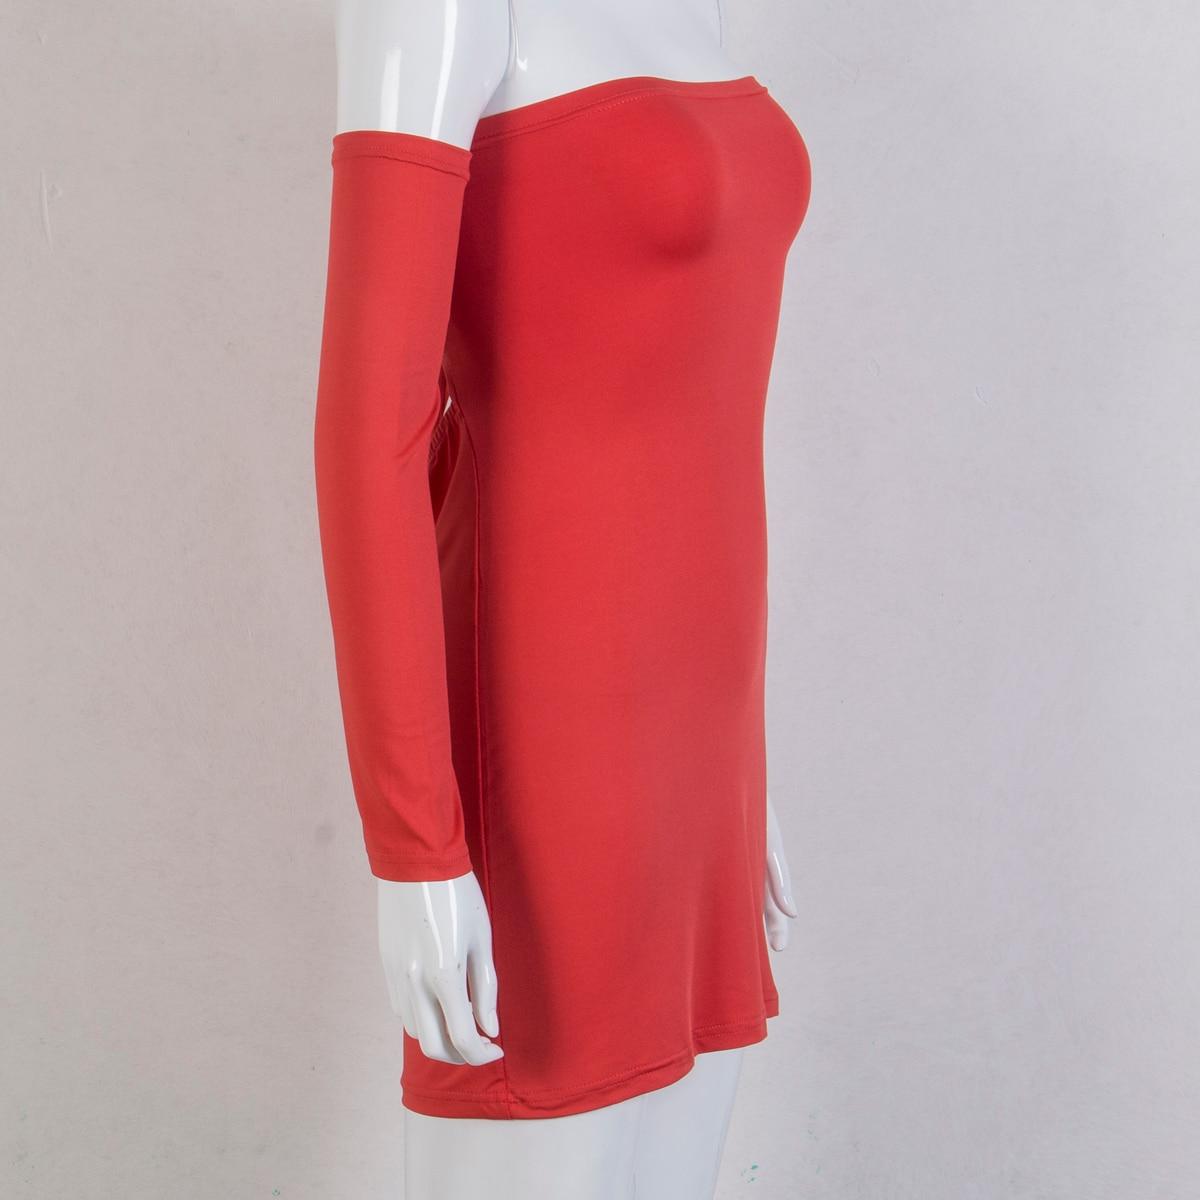 Hirigin Women's Summer Long Sleeve Slash Neck Hollow Bandage Bodycon Night Club Party Dress